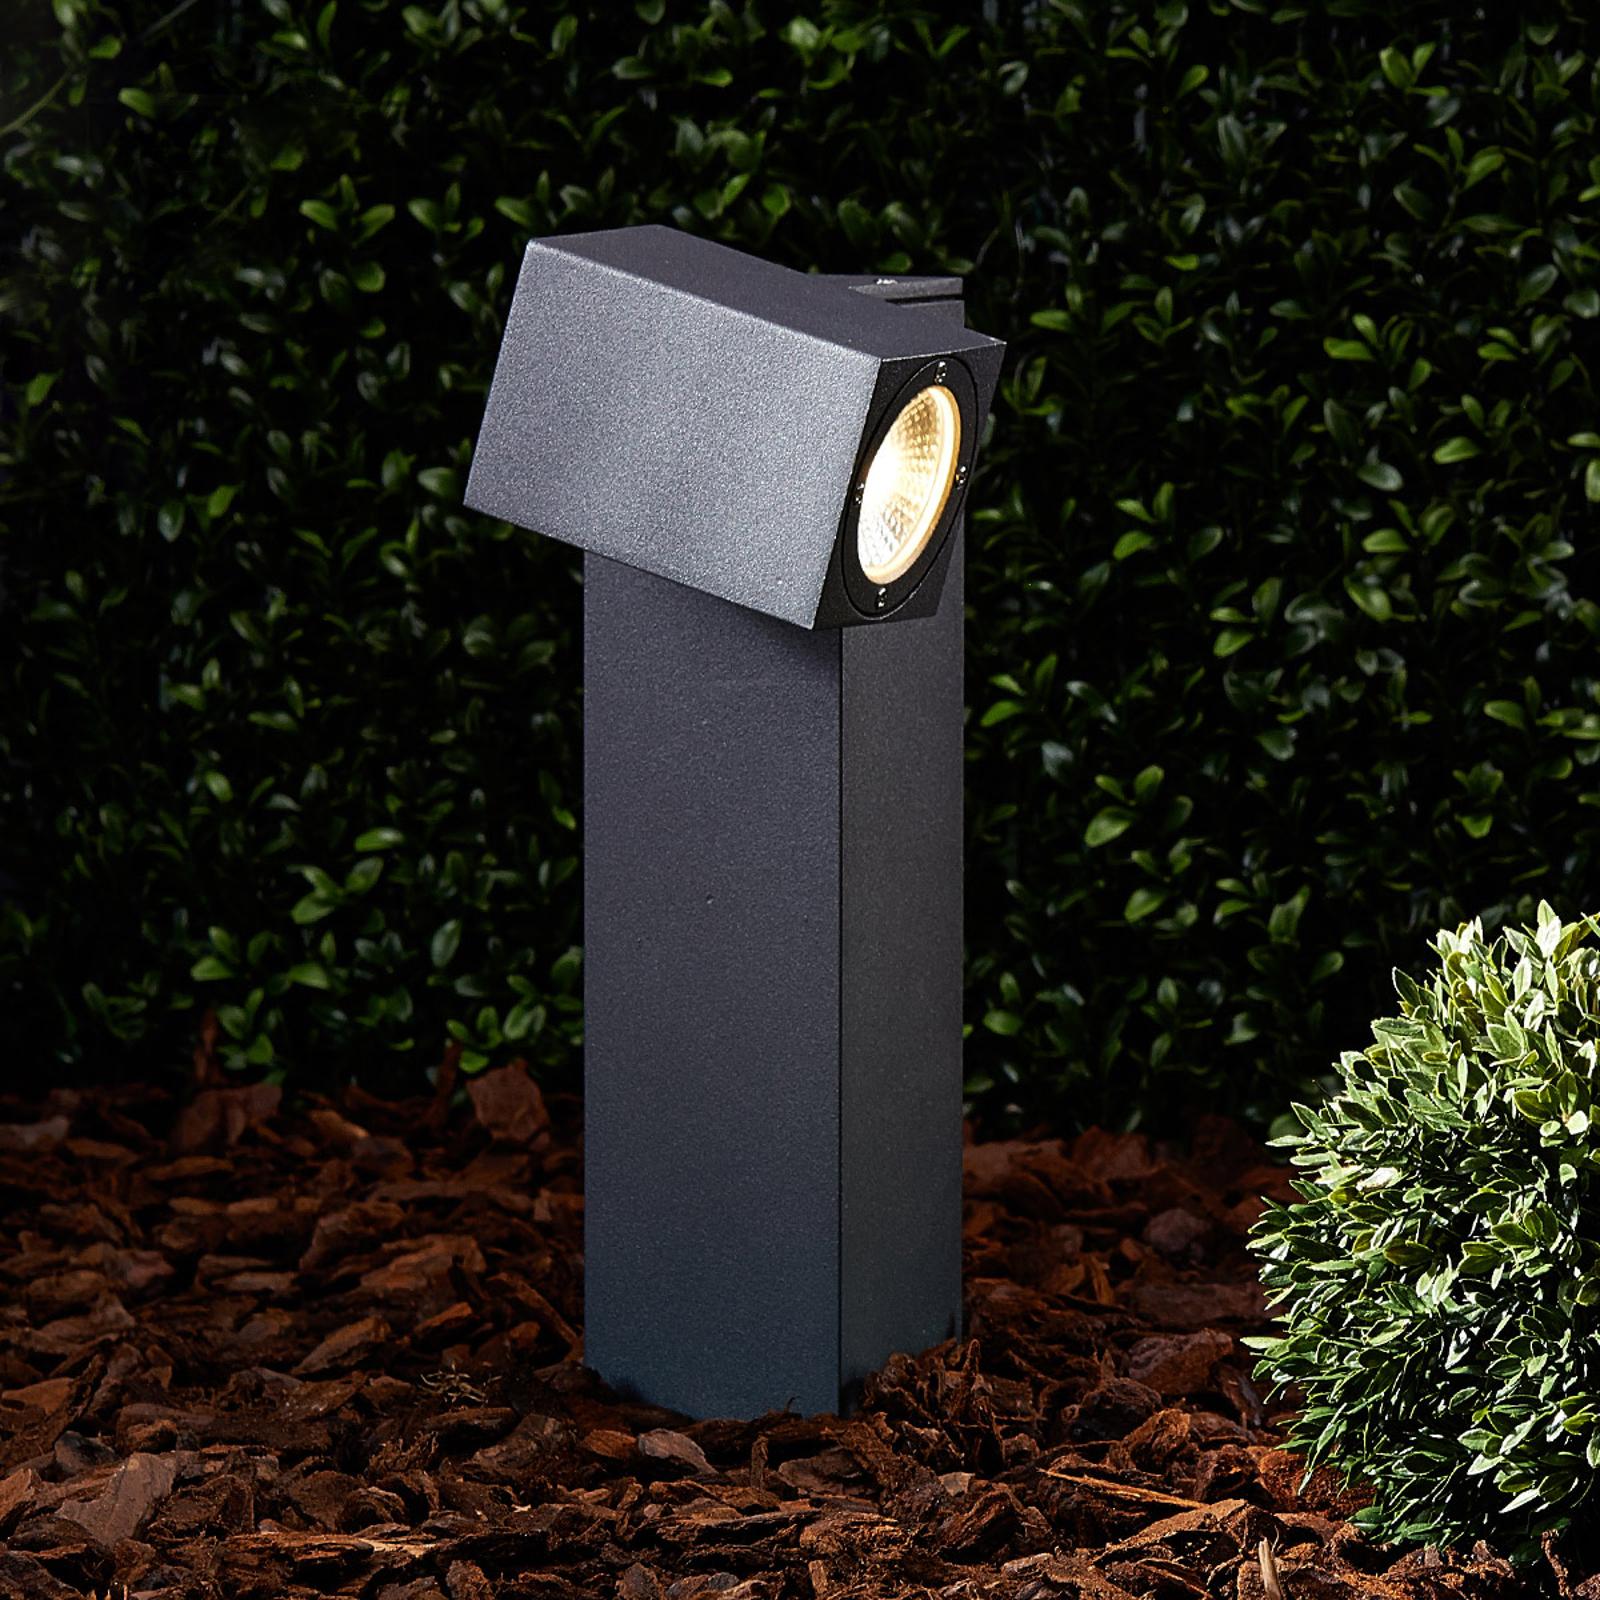 Lampione regolabile Lorik, a LED